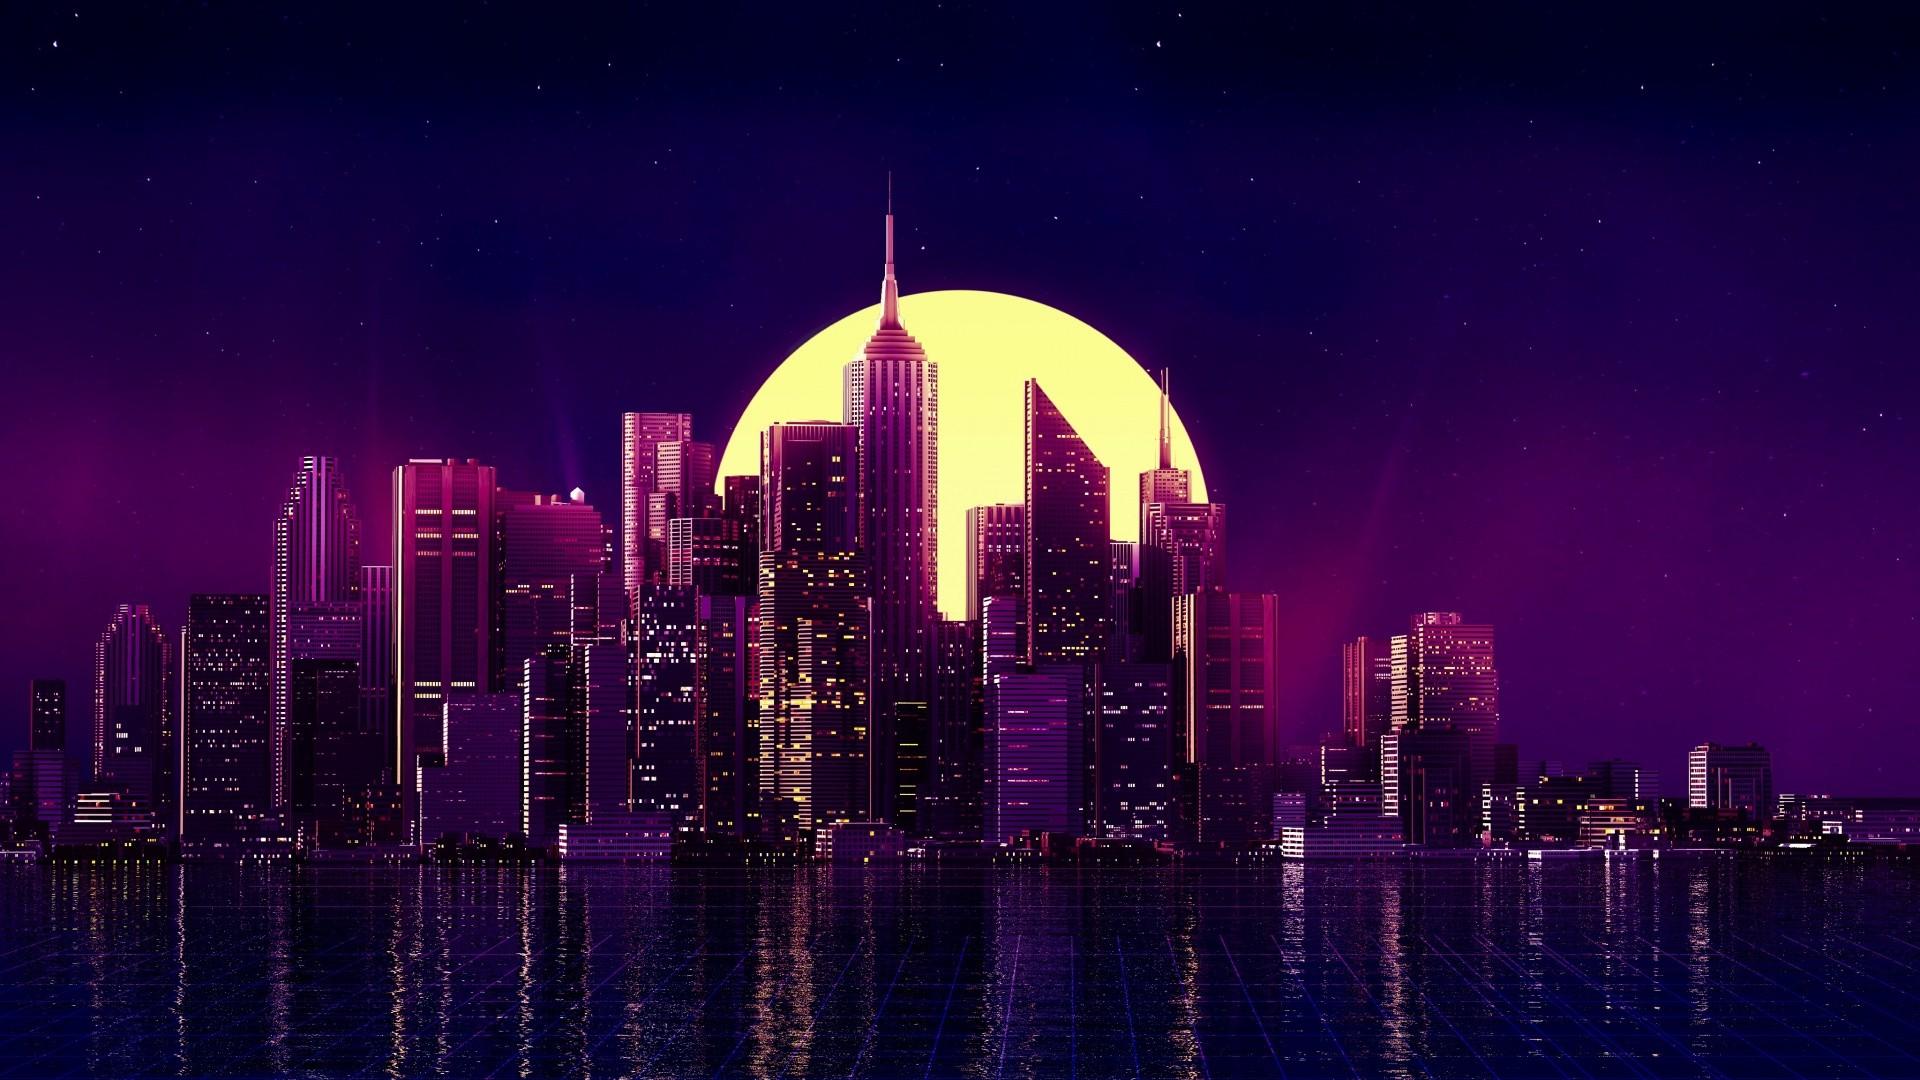 Neon City Background Wallpaper